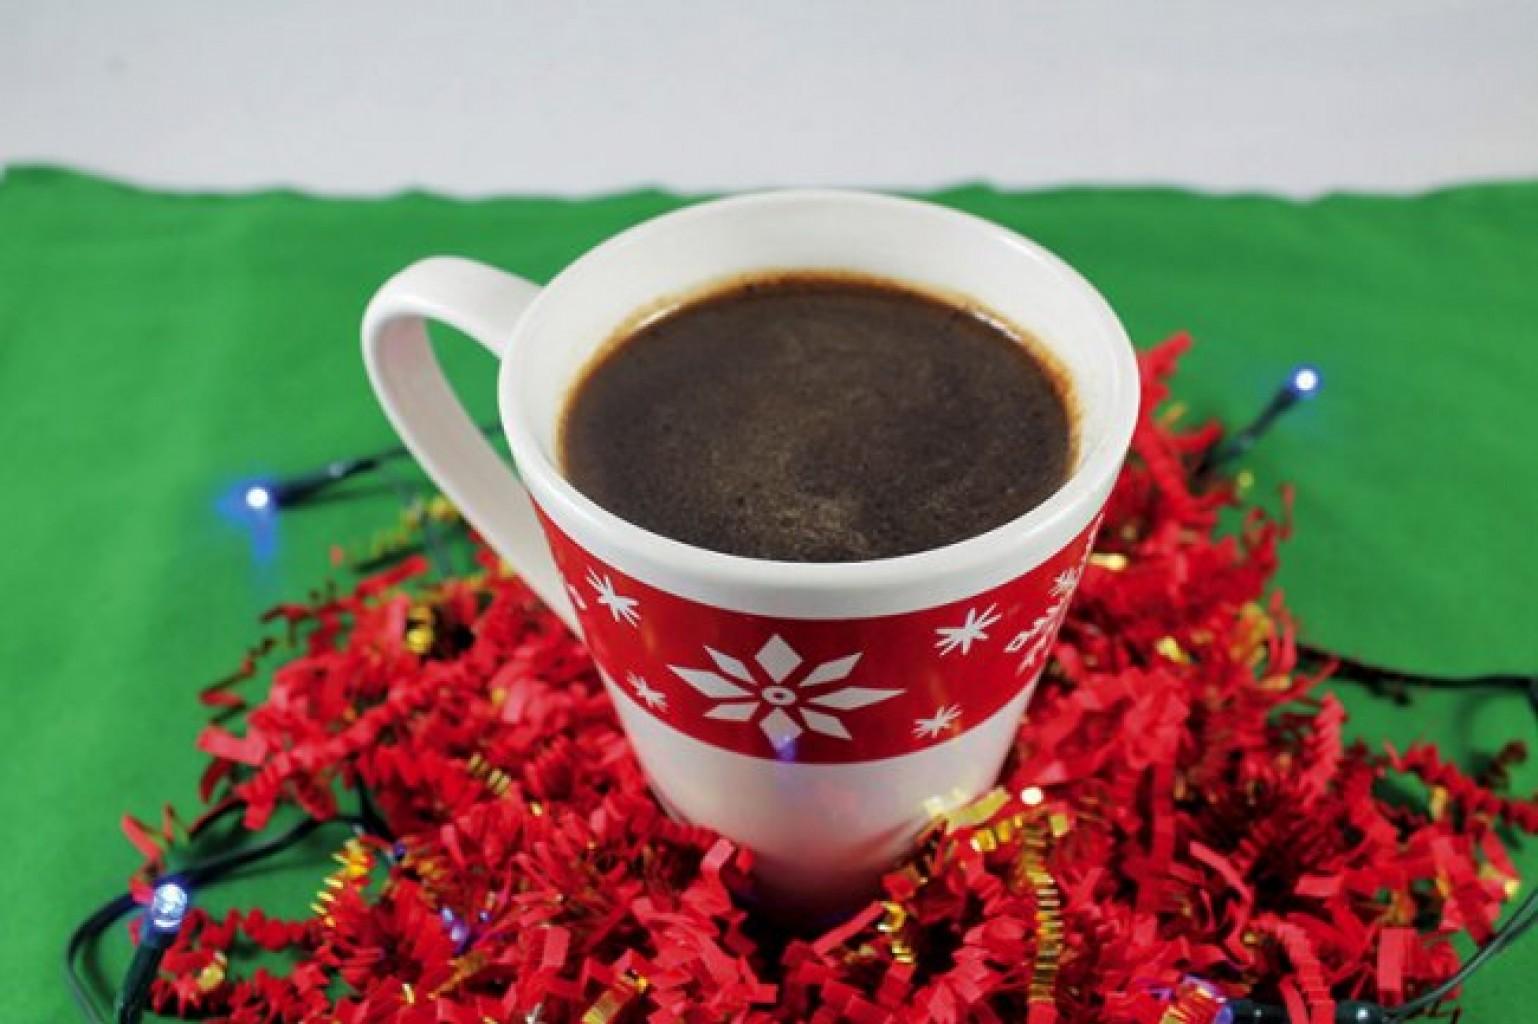 Chocolate casero con pedacitos  de chocolate semi-dulce